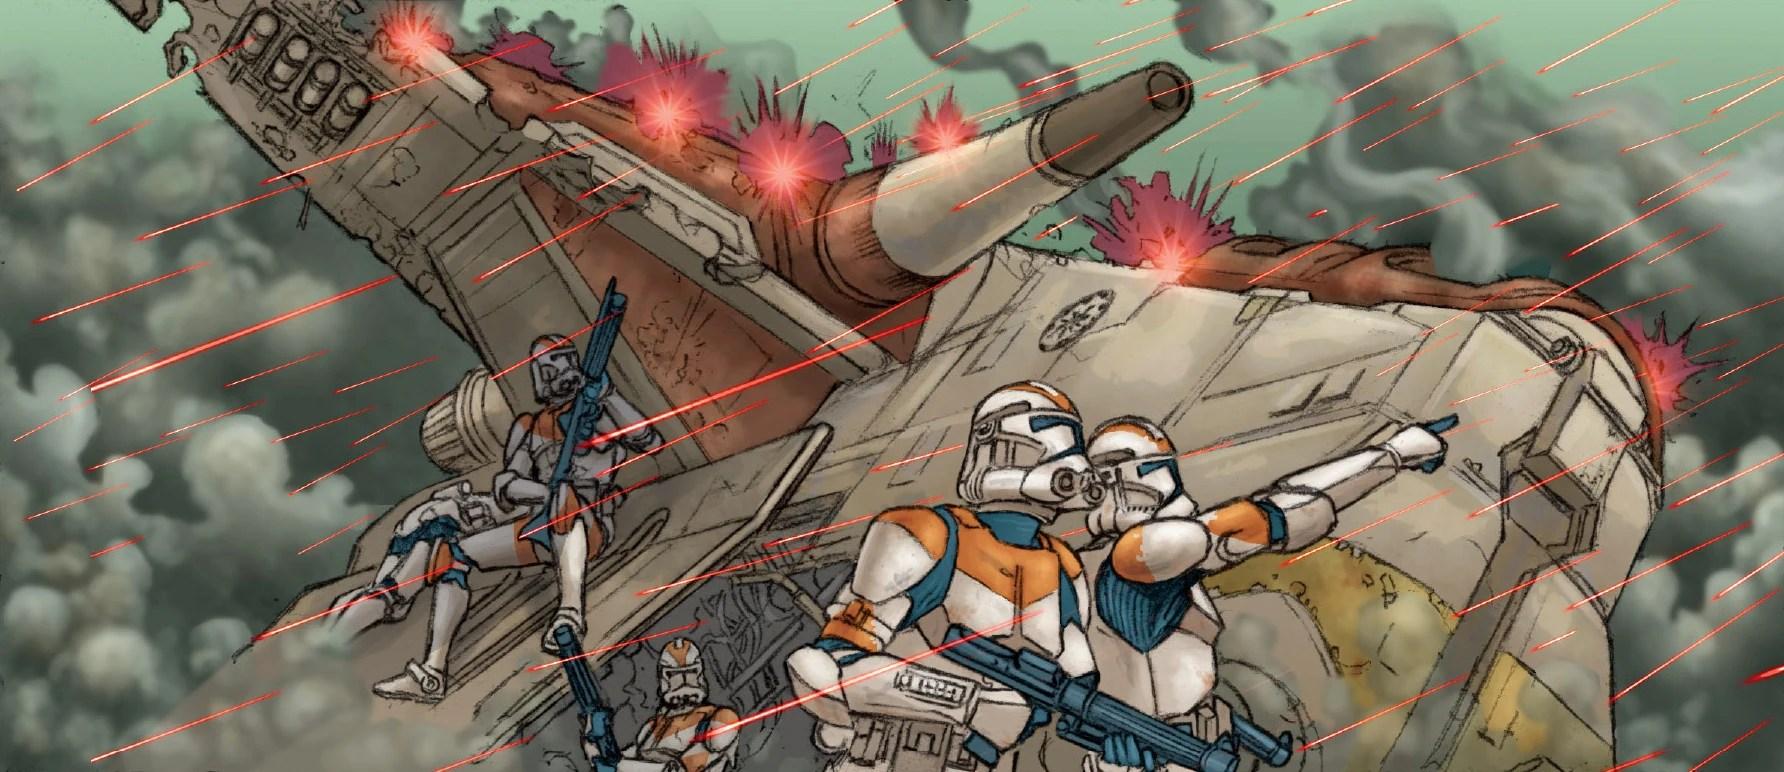 Star Wars Republic Gunship Crash